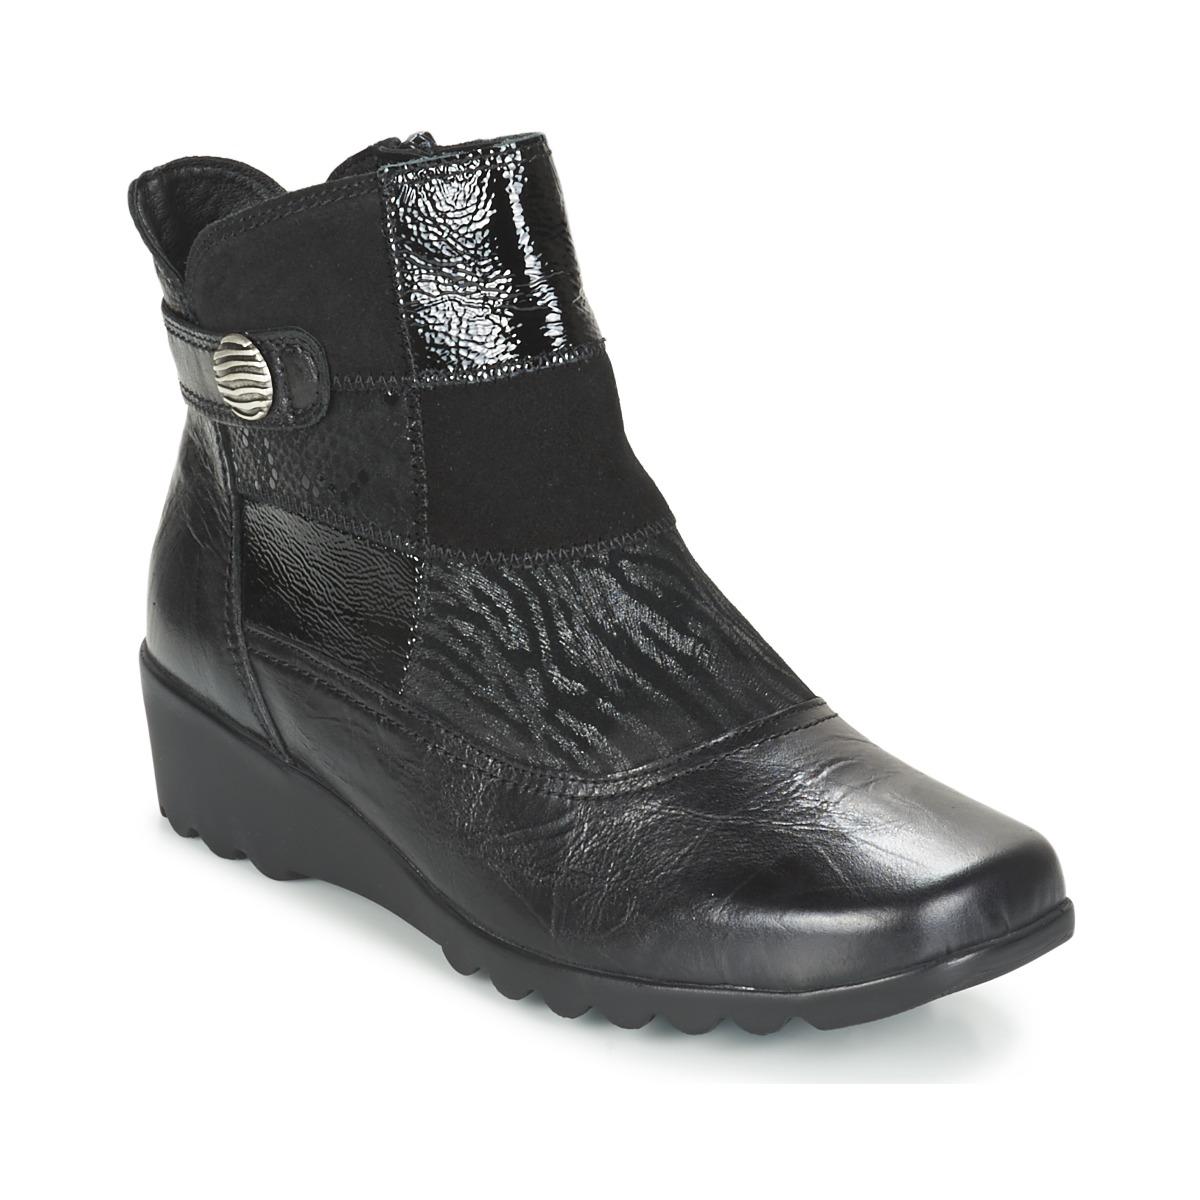 Romika Carree 16 Schwarz - Kostenloser Versand bei Spartoode ! - Schuhe Low Boots Damen 59,39 €